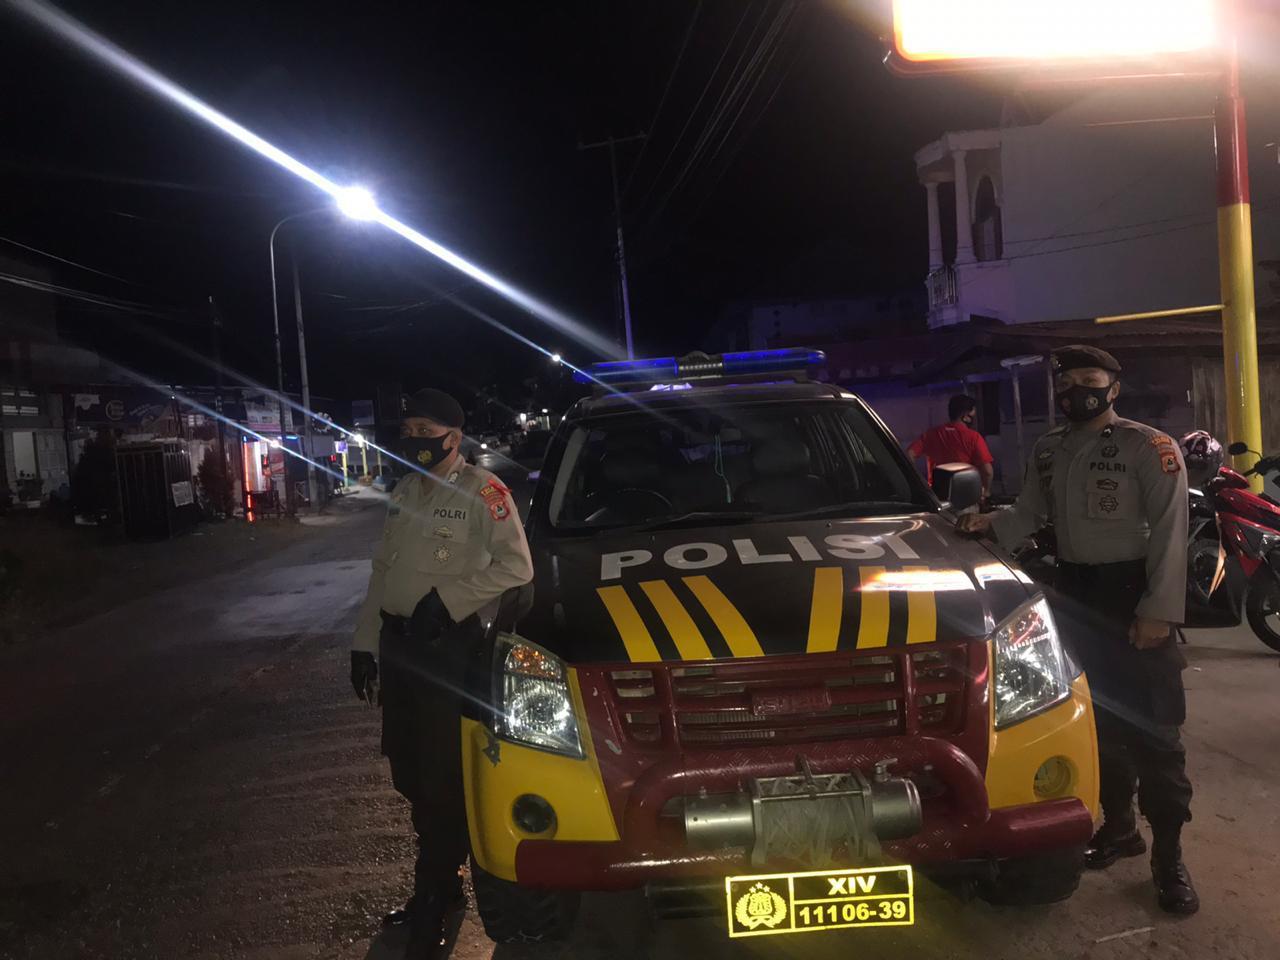 Beri Rasa Aman dan Nyaman Bagi Warga, Polres Soppeng Gelar Blue Light Patrol